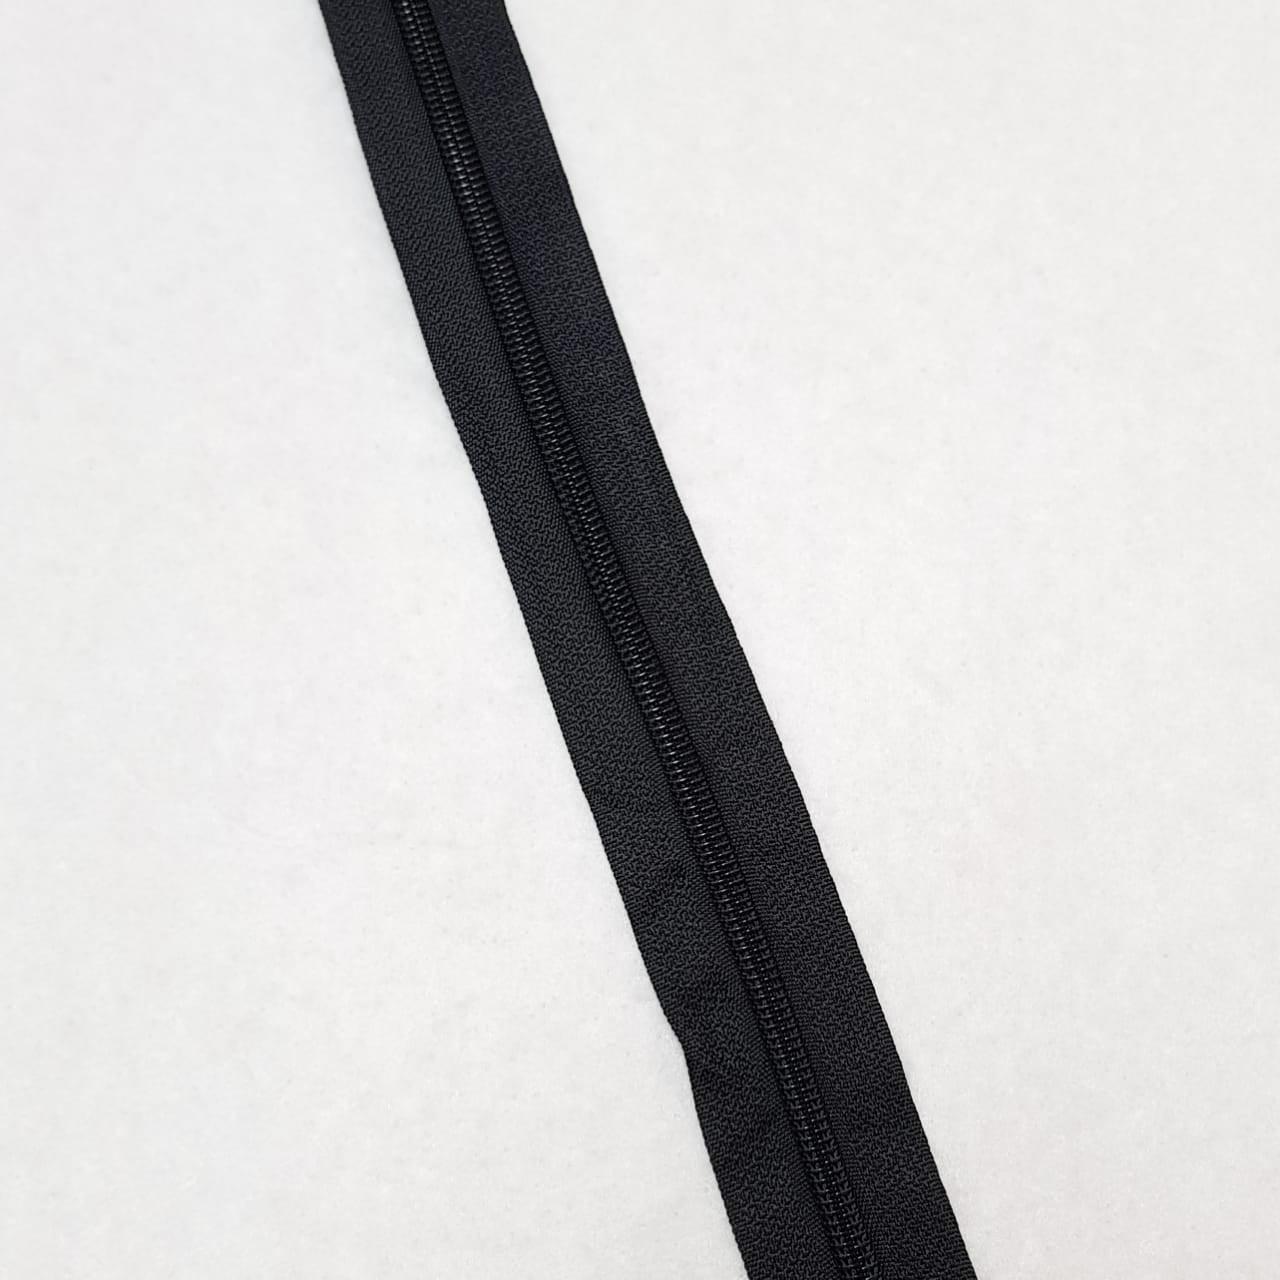 Zíper - ZR - 5mm - Preto